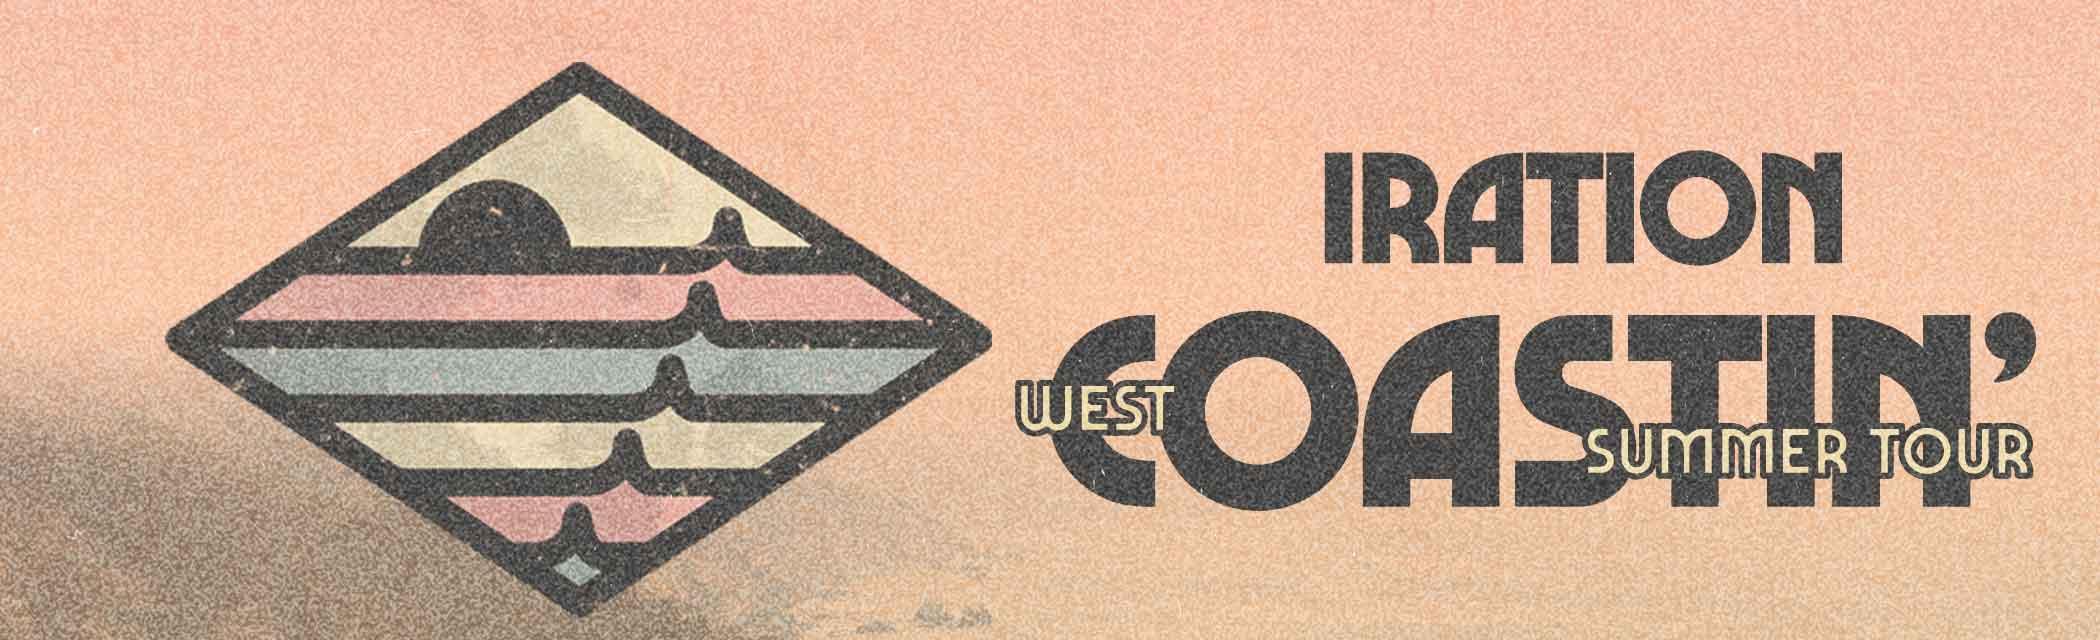 West Coastin' Summer Tour